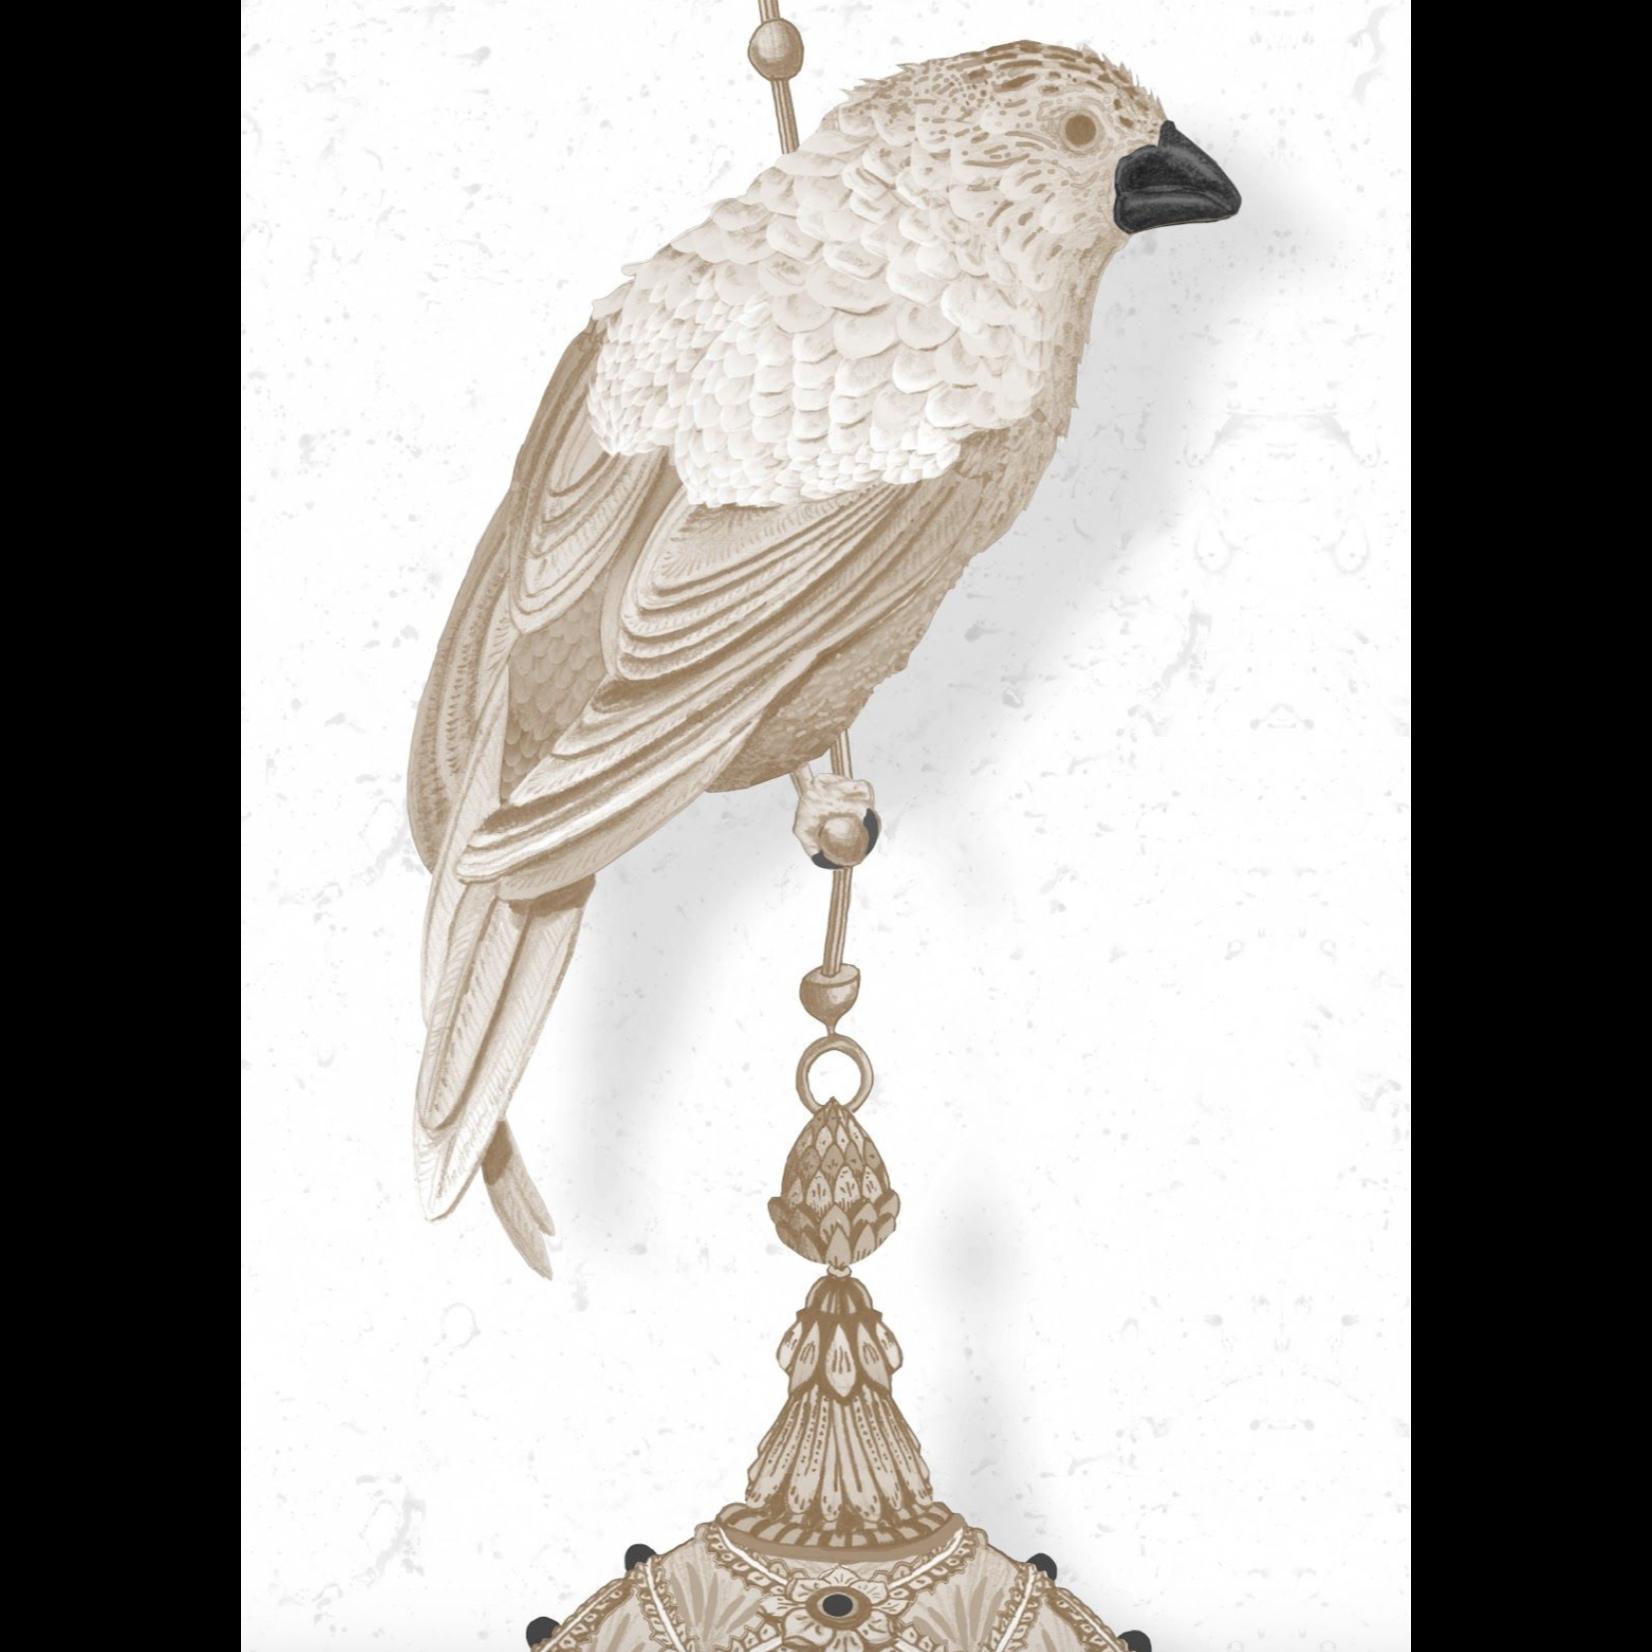 Kit Miles Pendants and Ornamental Birds | Stone